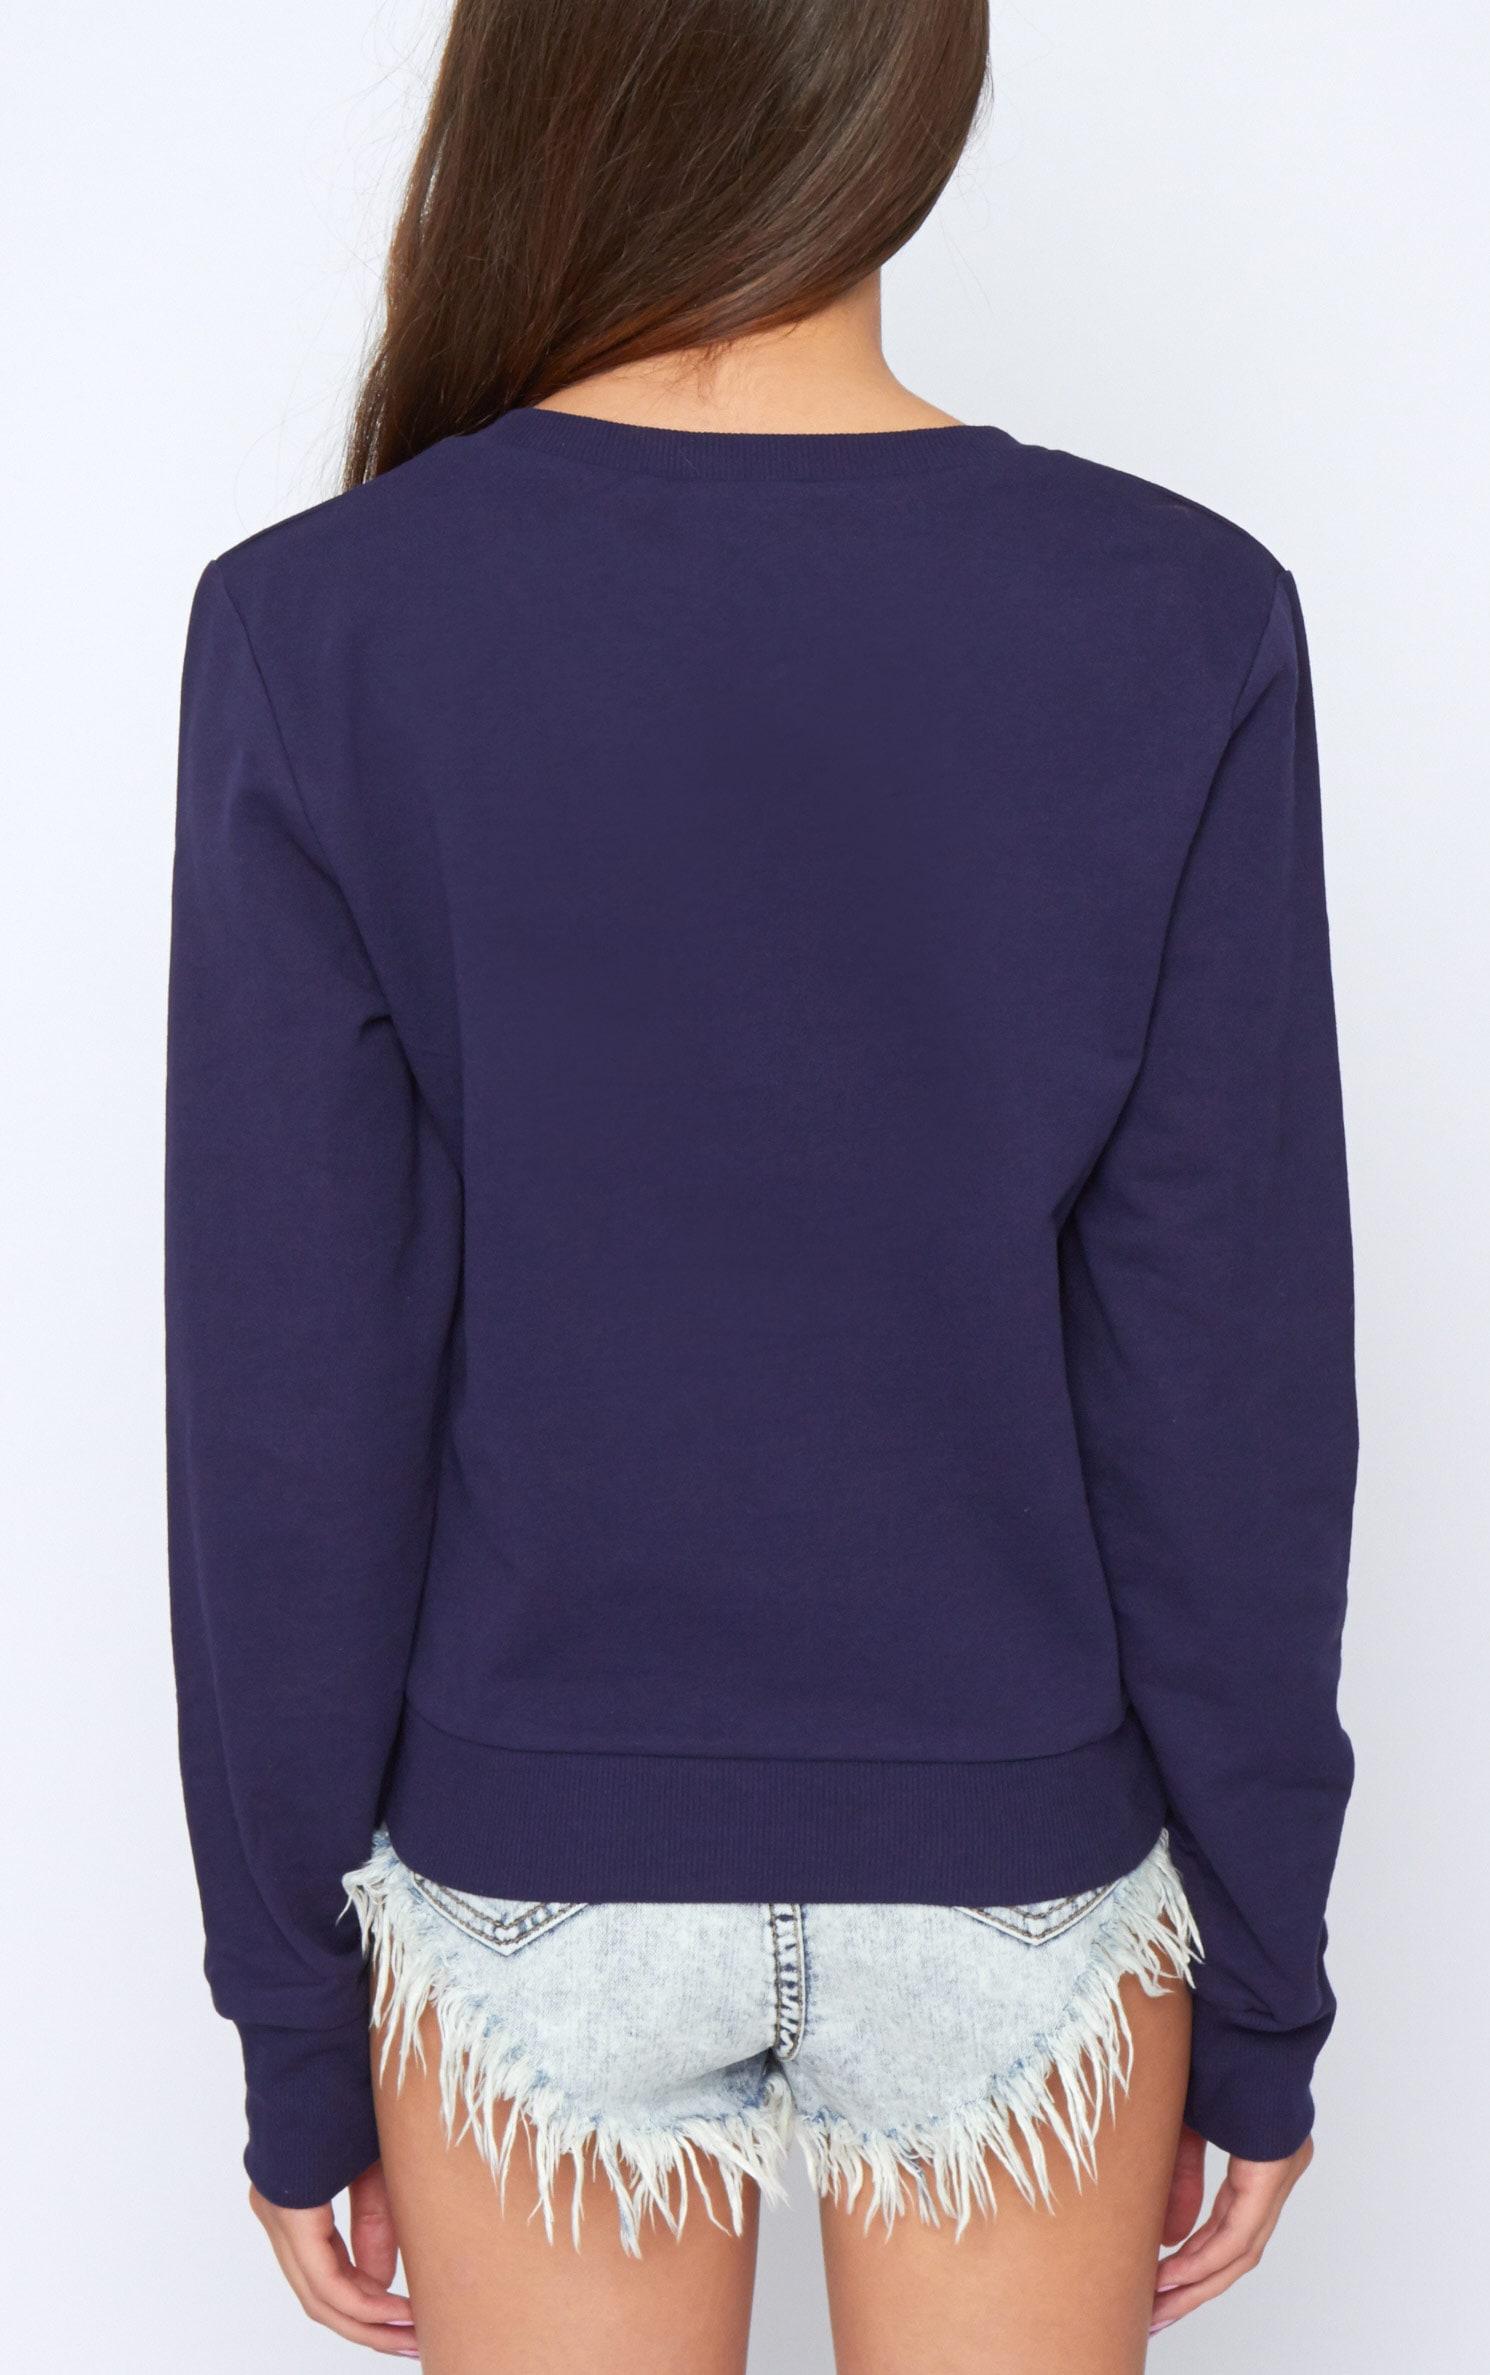 Dionne Navy 'A' Sweatshirt 2